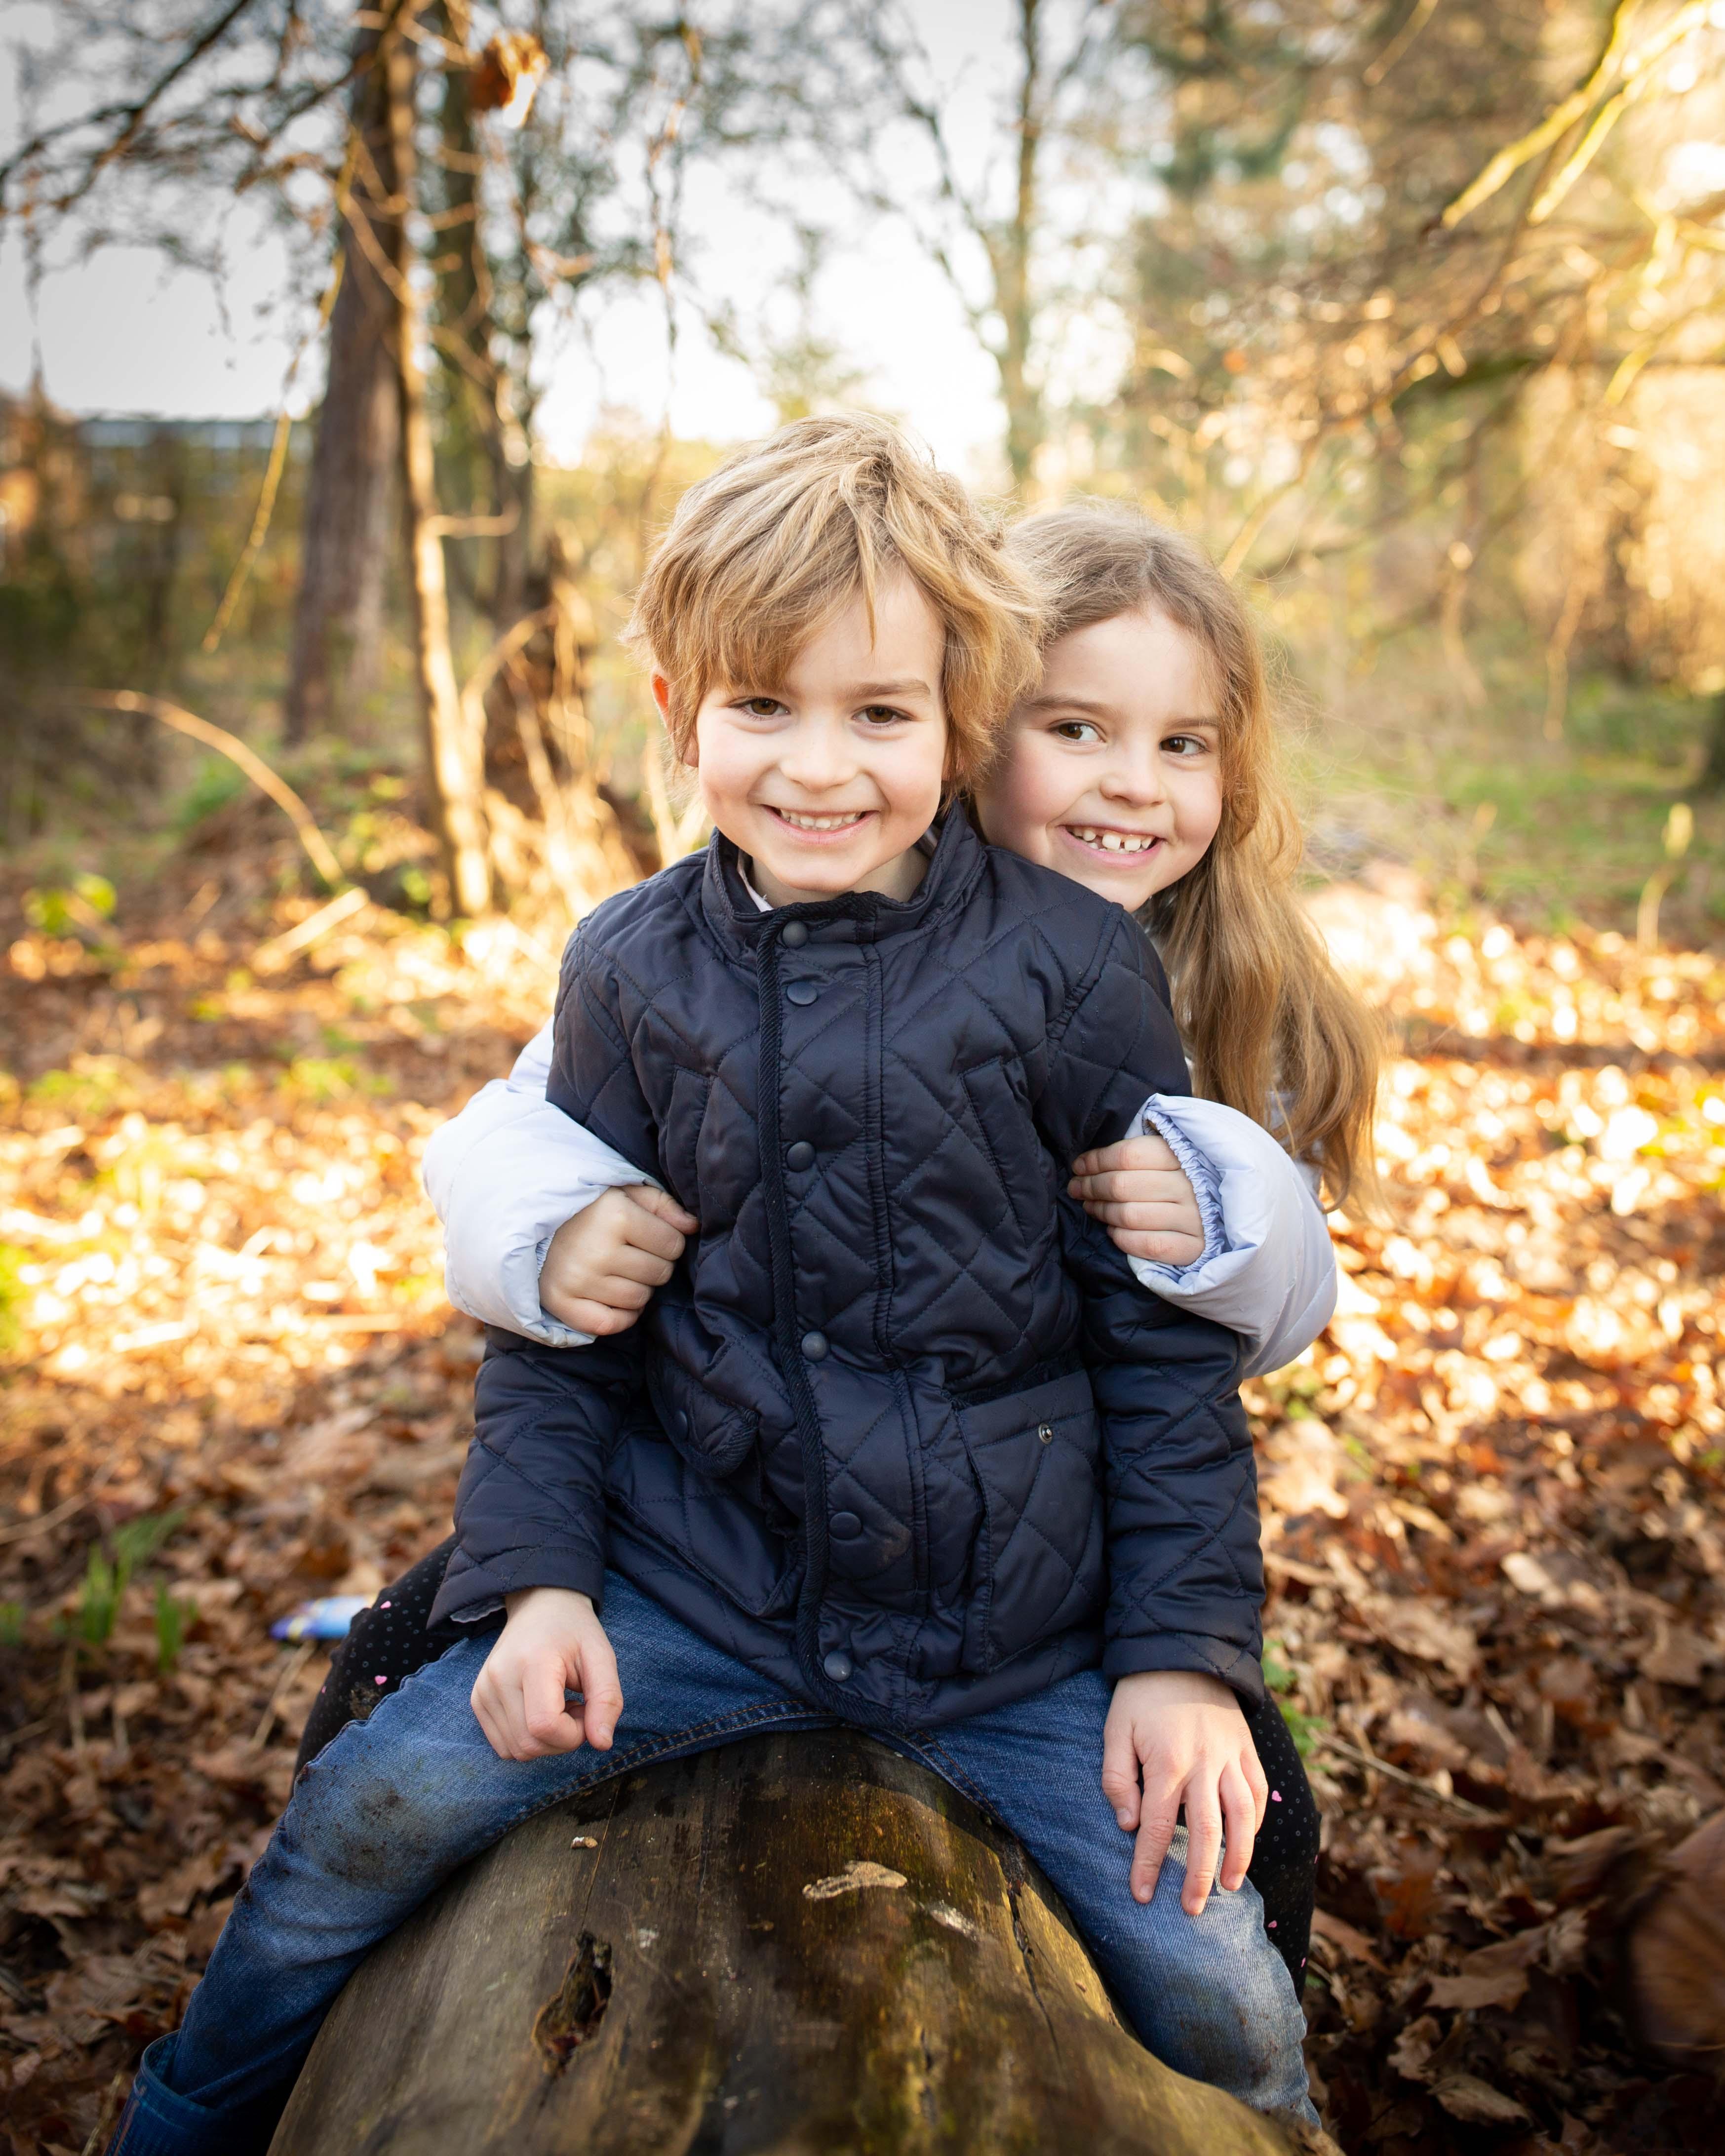 Autumn Family Photo Bedfordshire